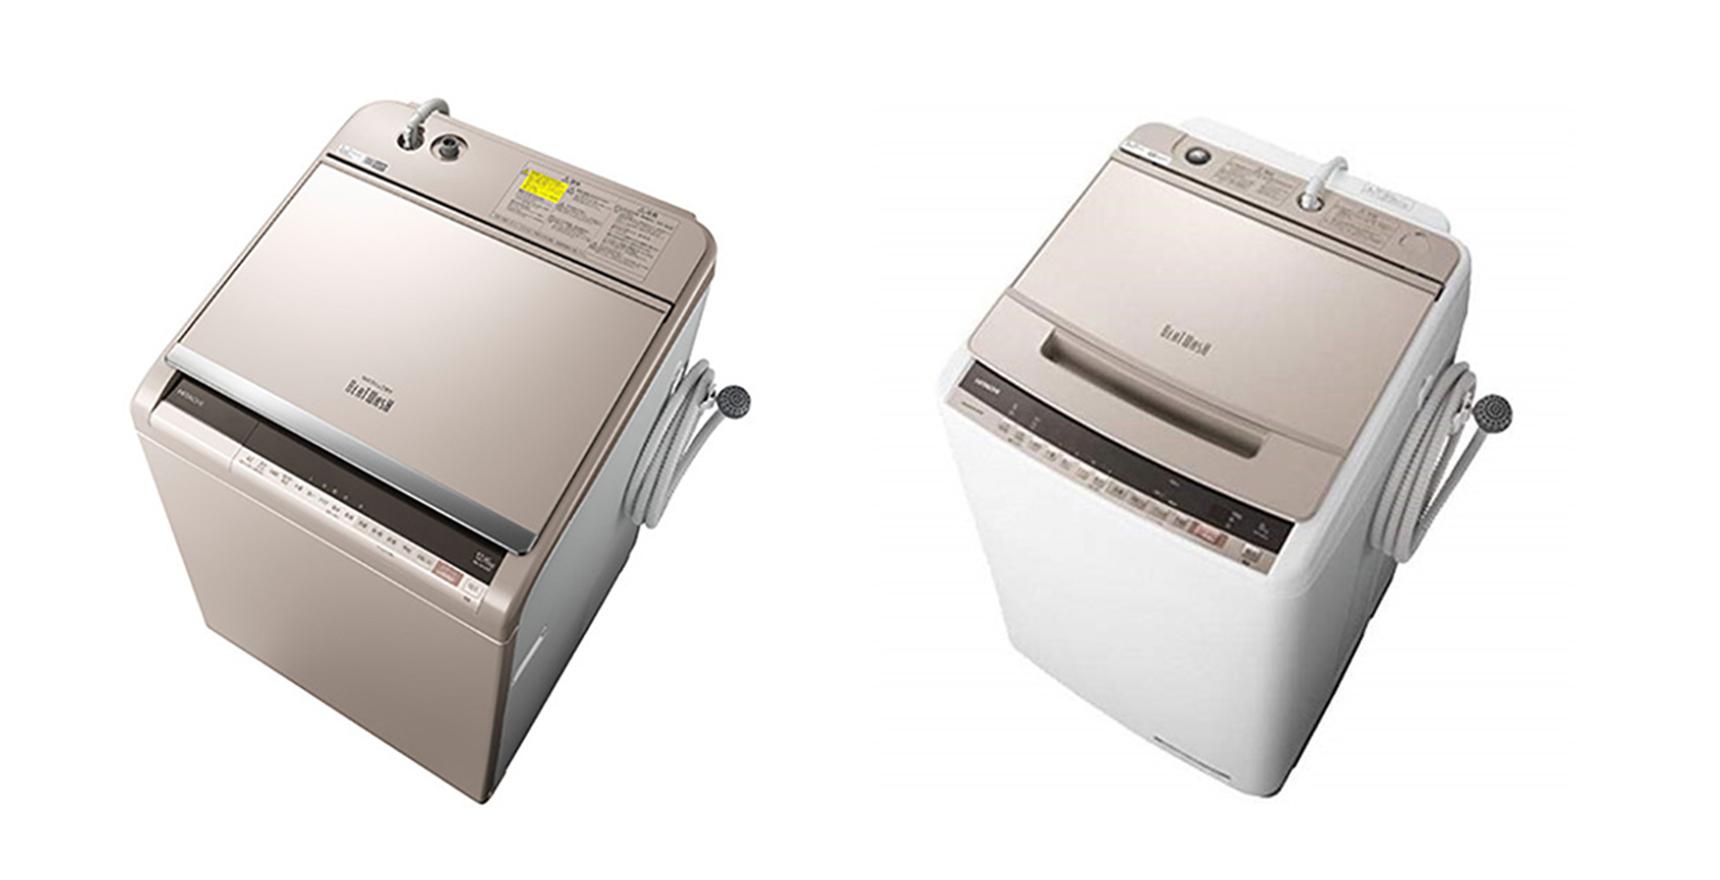 HITACHI(日立)の洗濯機